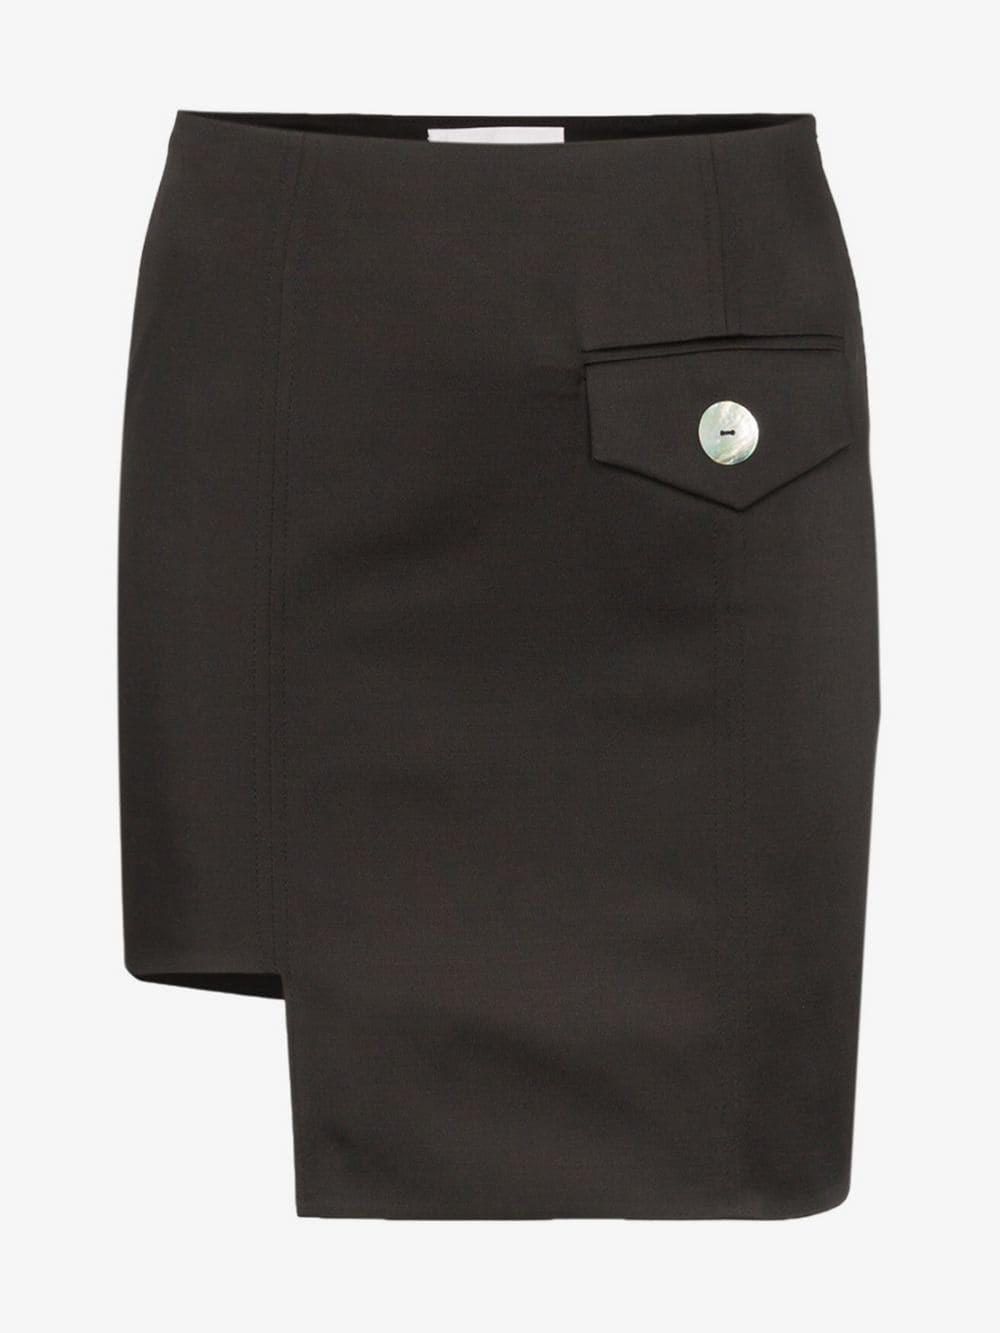 George Keburia envelope pocket asymmetric mini skirt in black